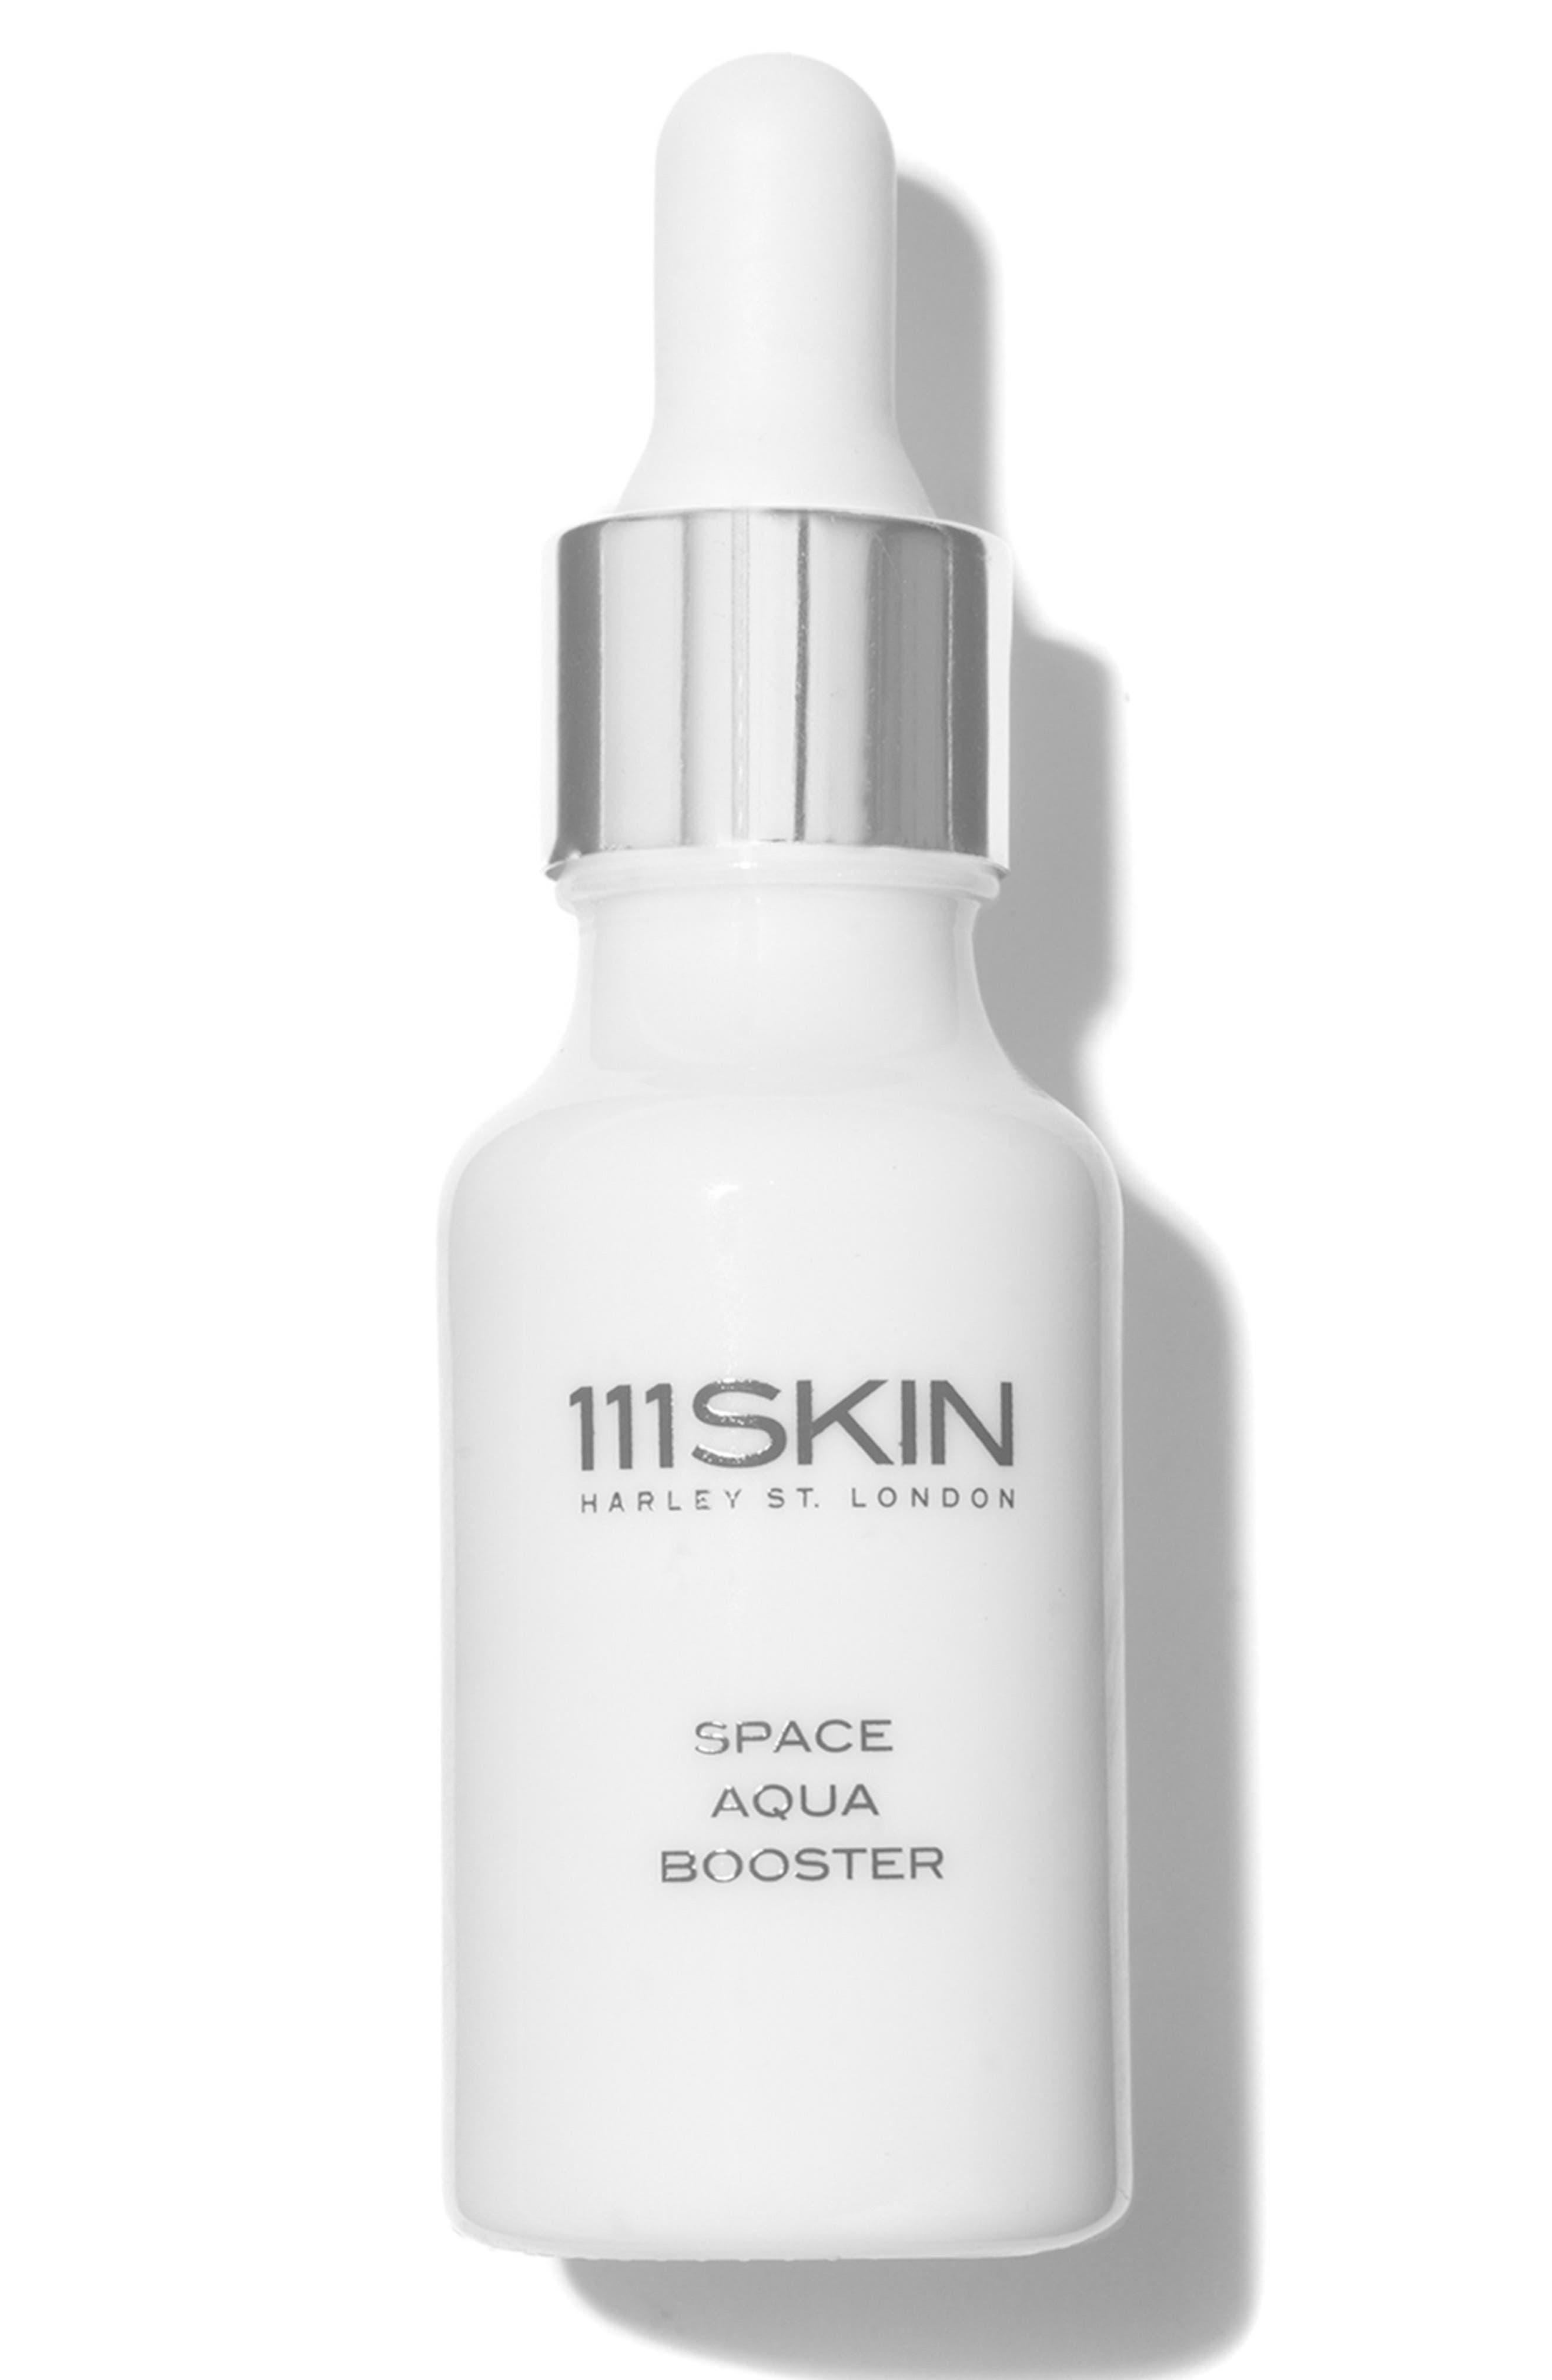 SPACE.NK.apothecary 111SKIN Space Aqua Booster,                         Main,                         color, NO COLOR